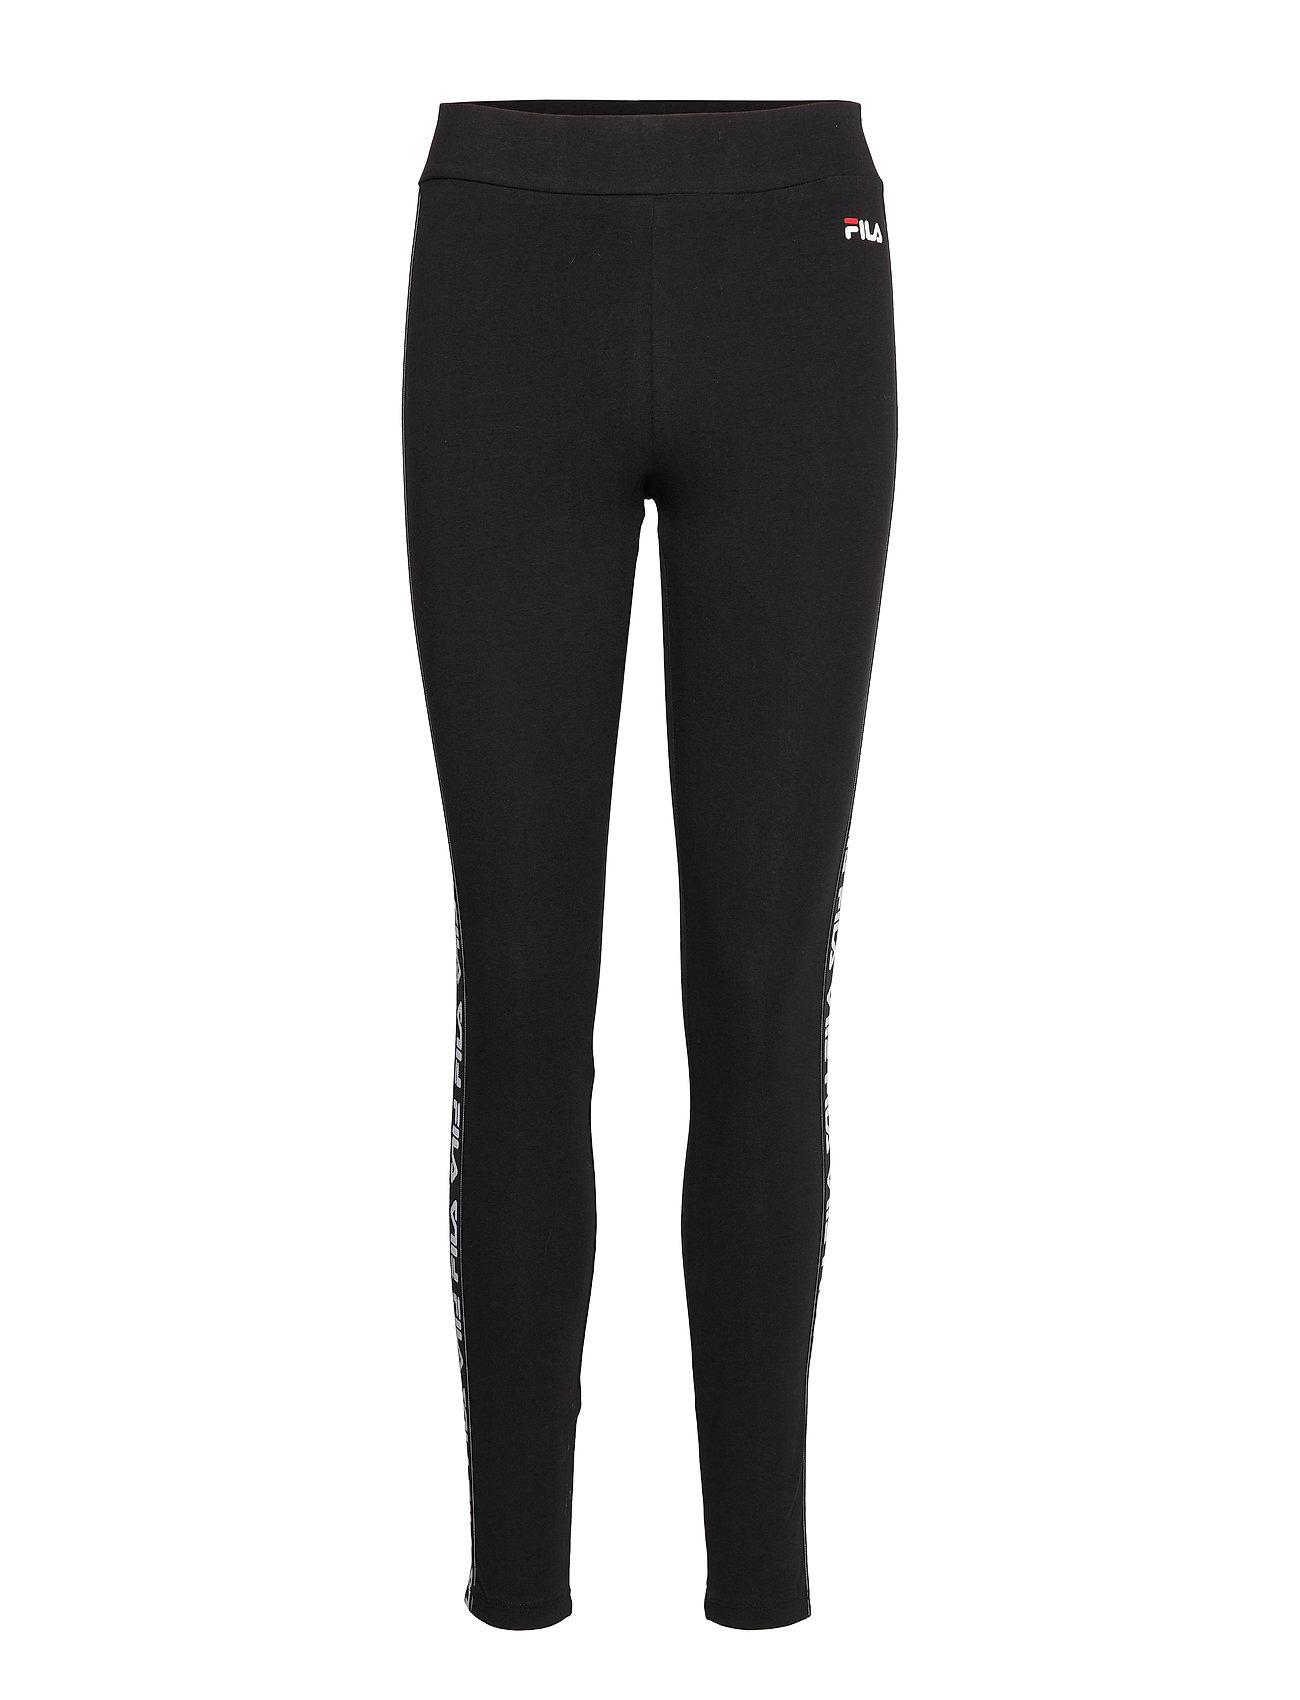 FILA WOMEN PHILINE leggings - 002 - BLACK